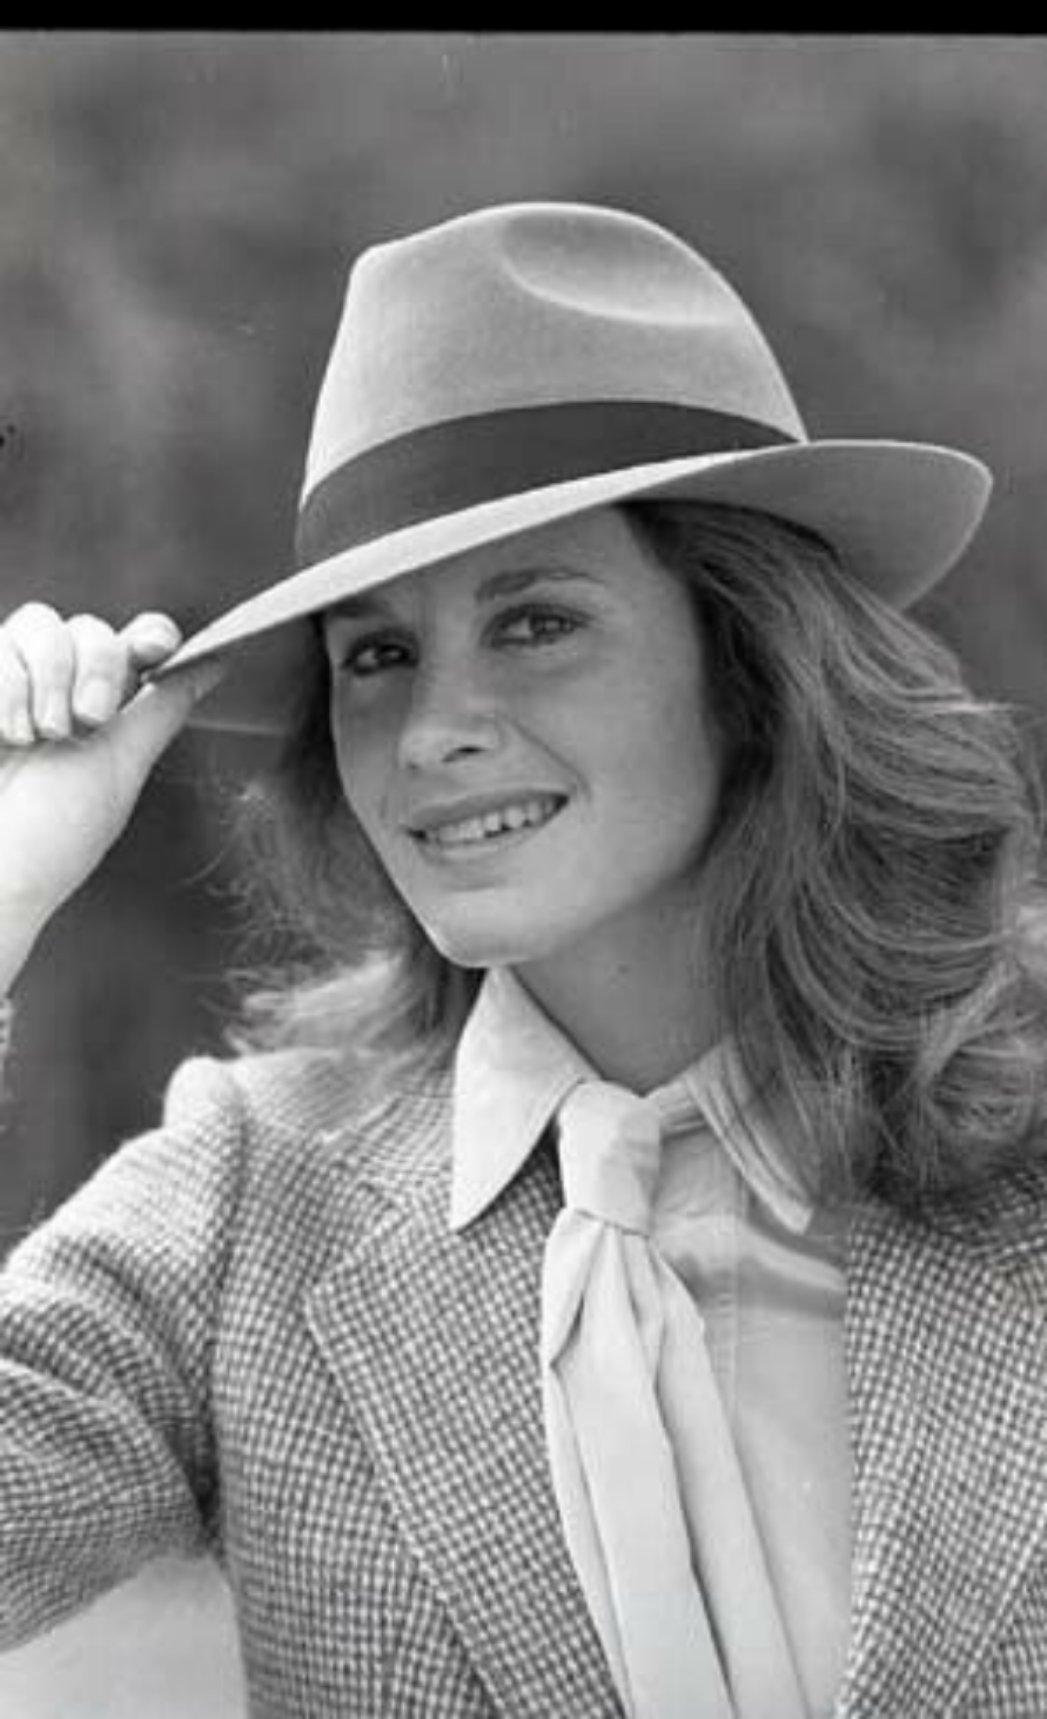 Name:  Stephanie-Zimbalist-Smiling-Fedora-Remington-Steele-1983-Nbc.jpg Views: 88 Size:  173.7 KB